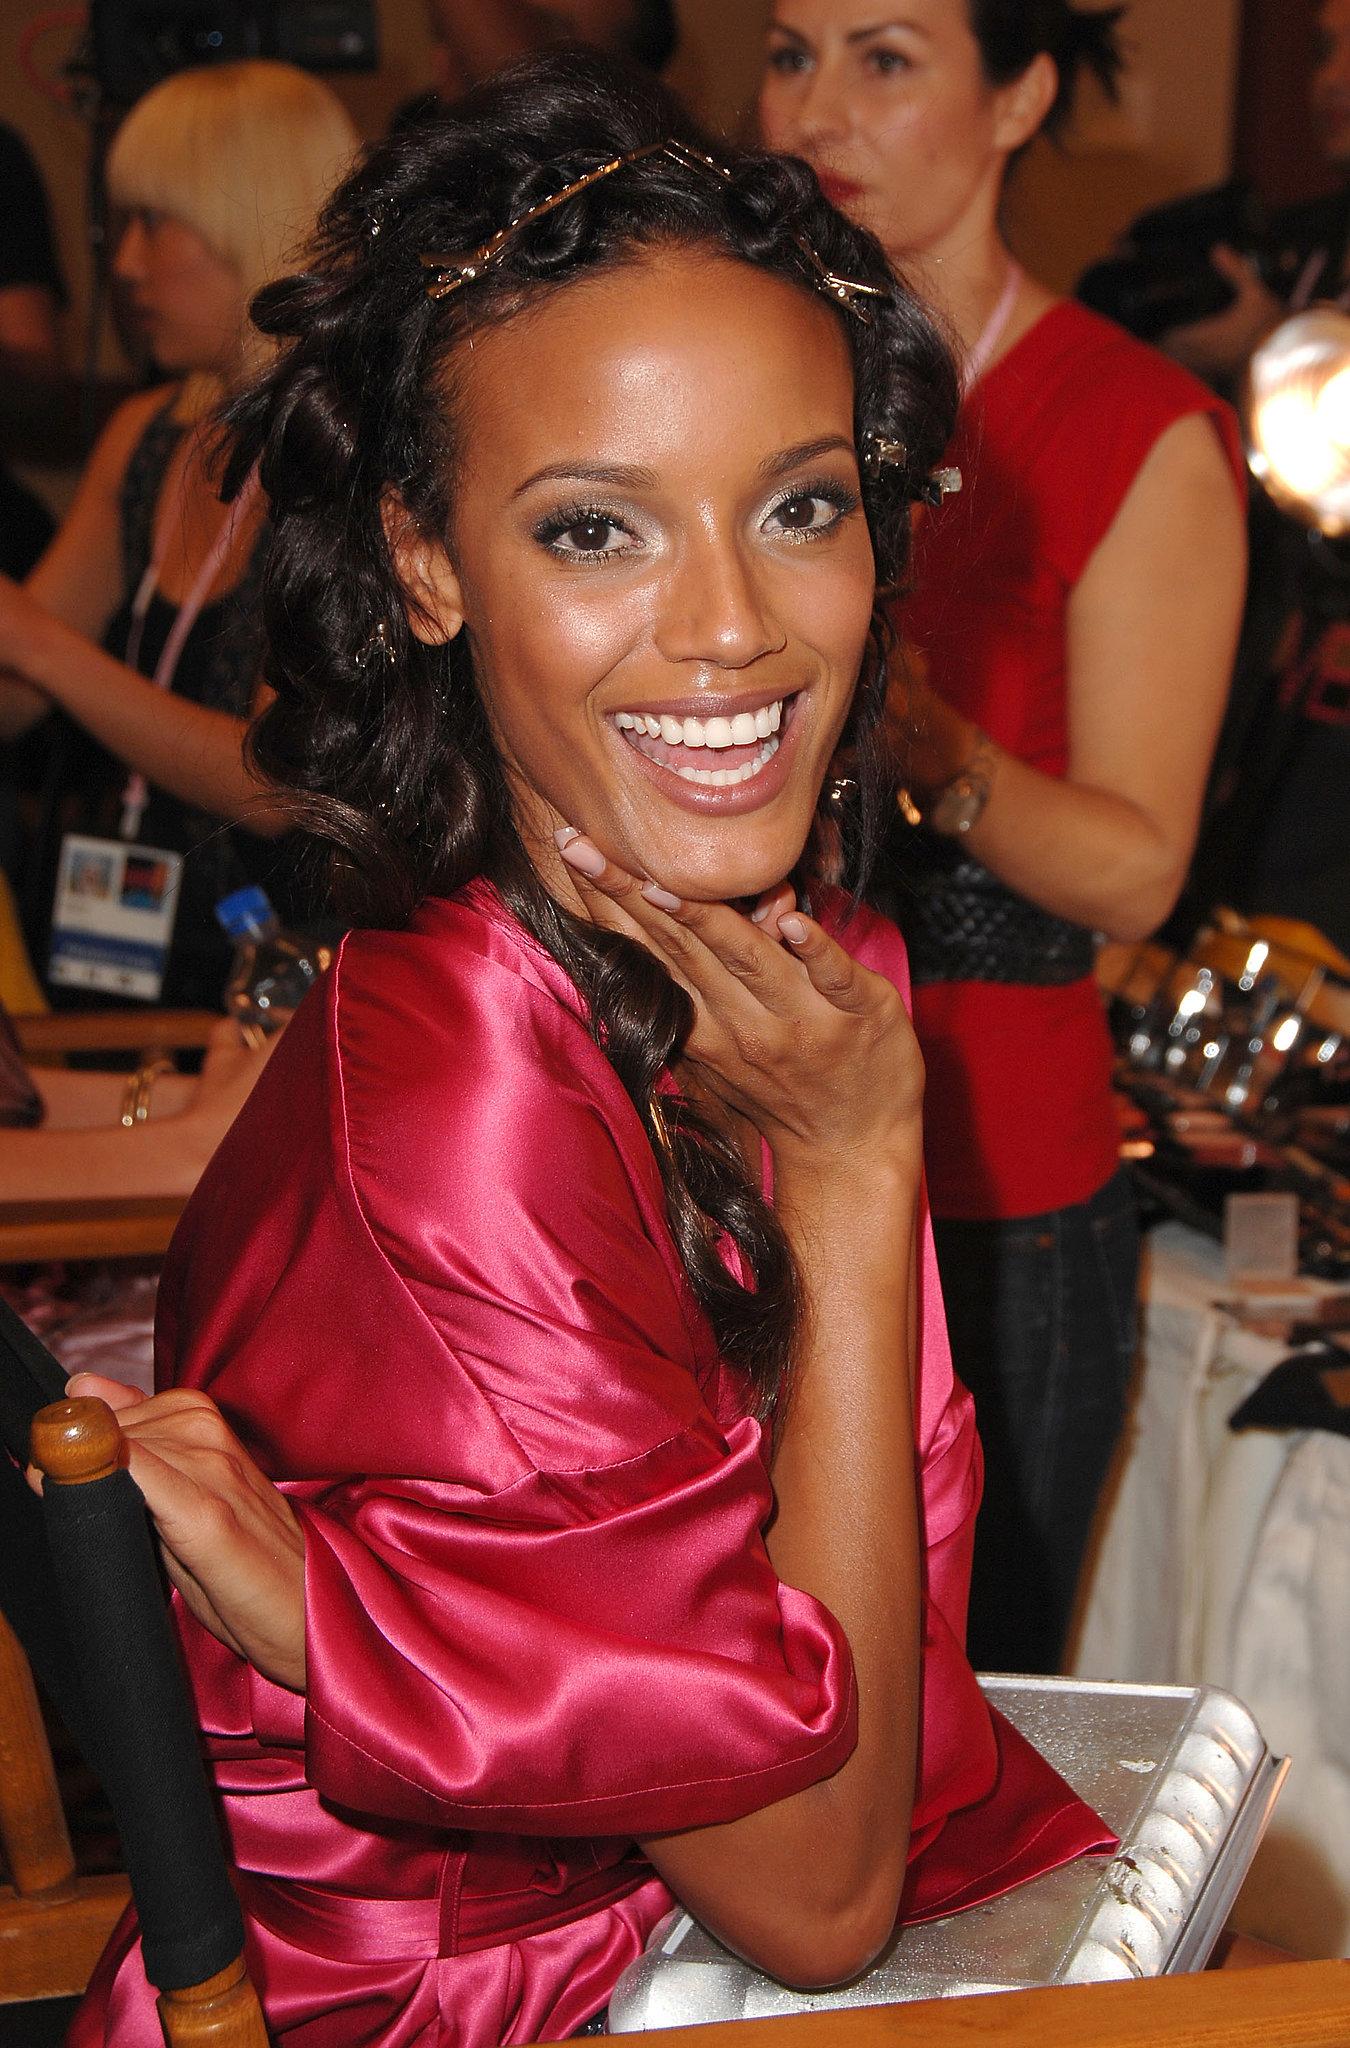 Selita Ebanks looked totally glowing backstage in 2007.